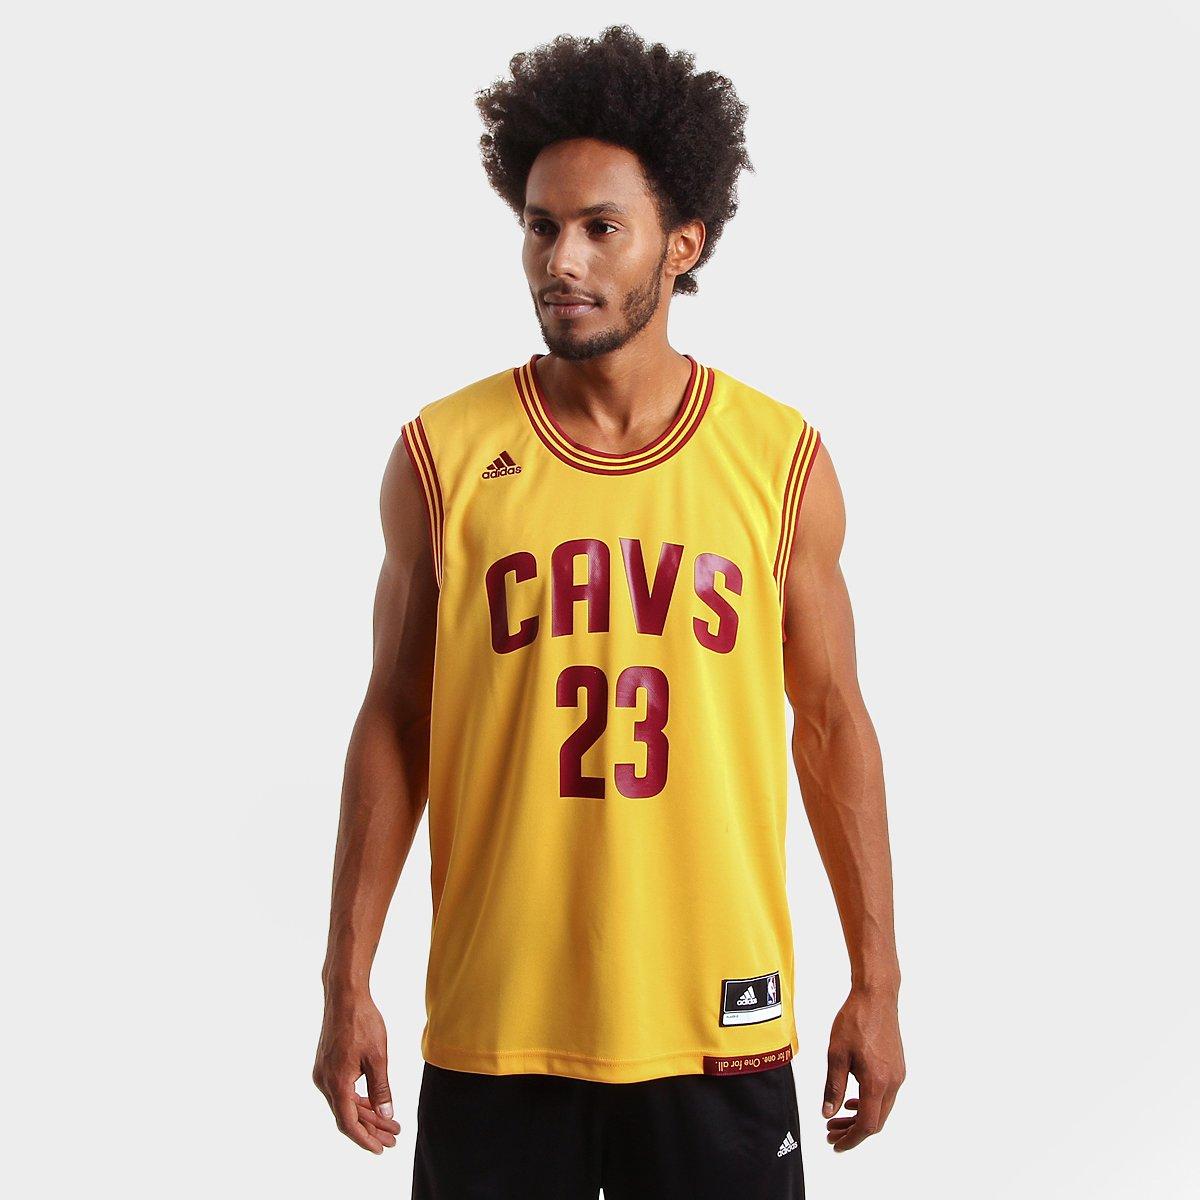 fb5baecd6 Camiseta Regata Adidas NBA Cleveland Cavaliers - James - Compre Agora